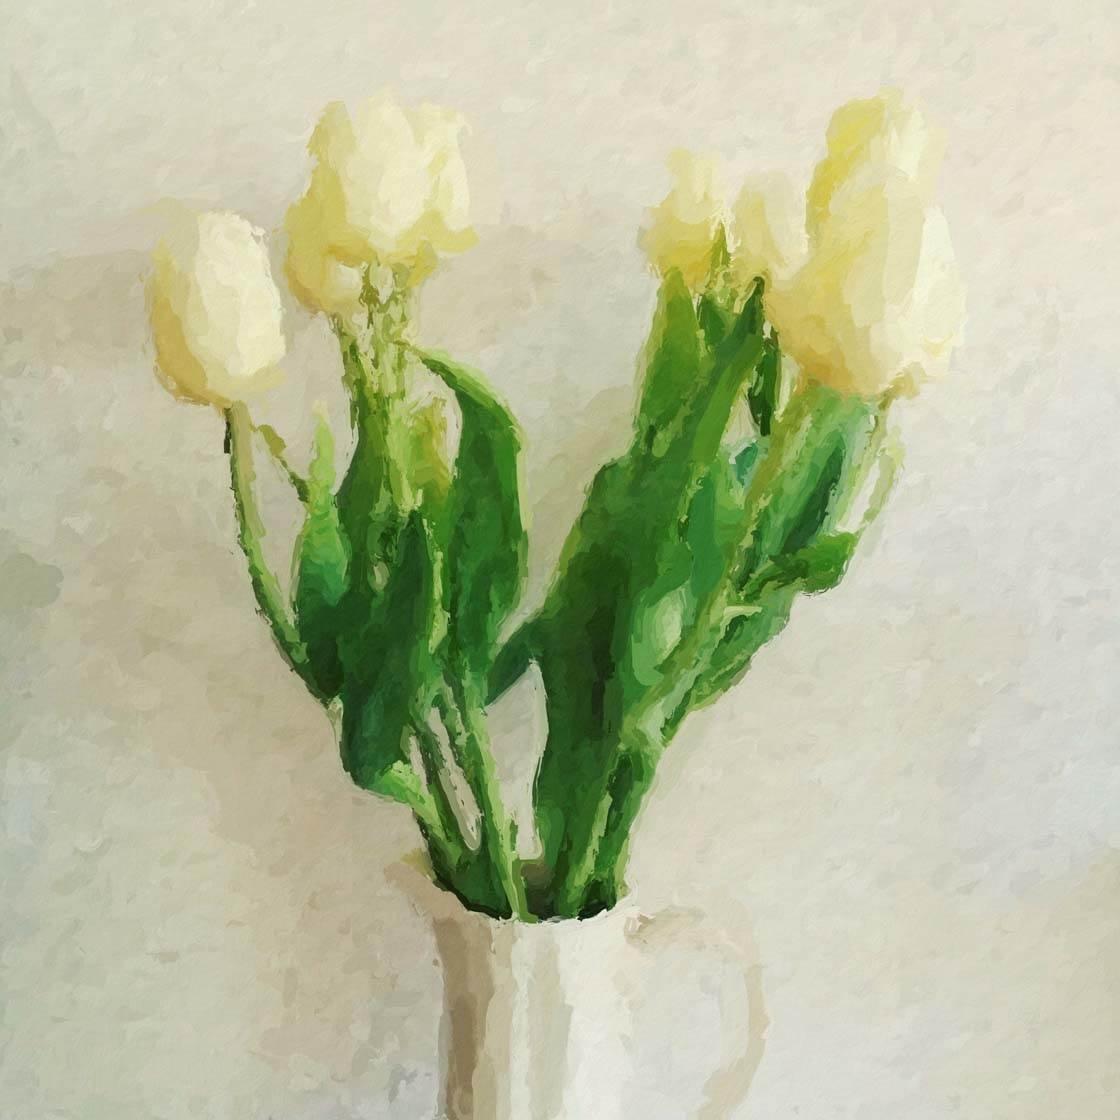 iPhone Flower Photography 29 no script